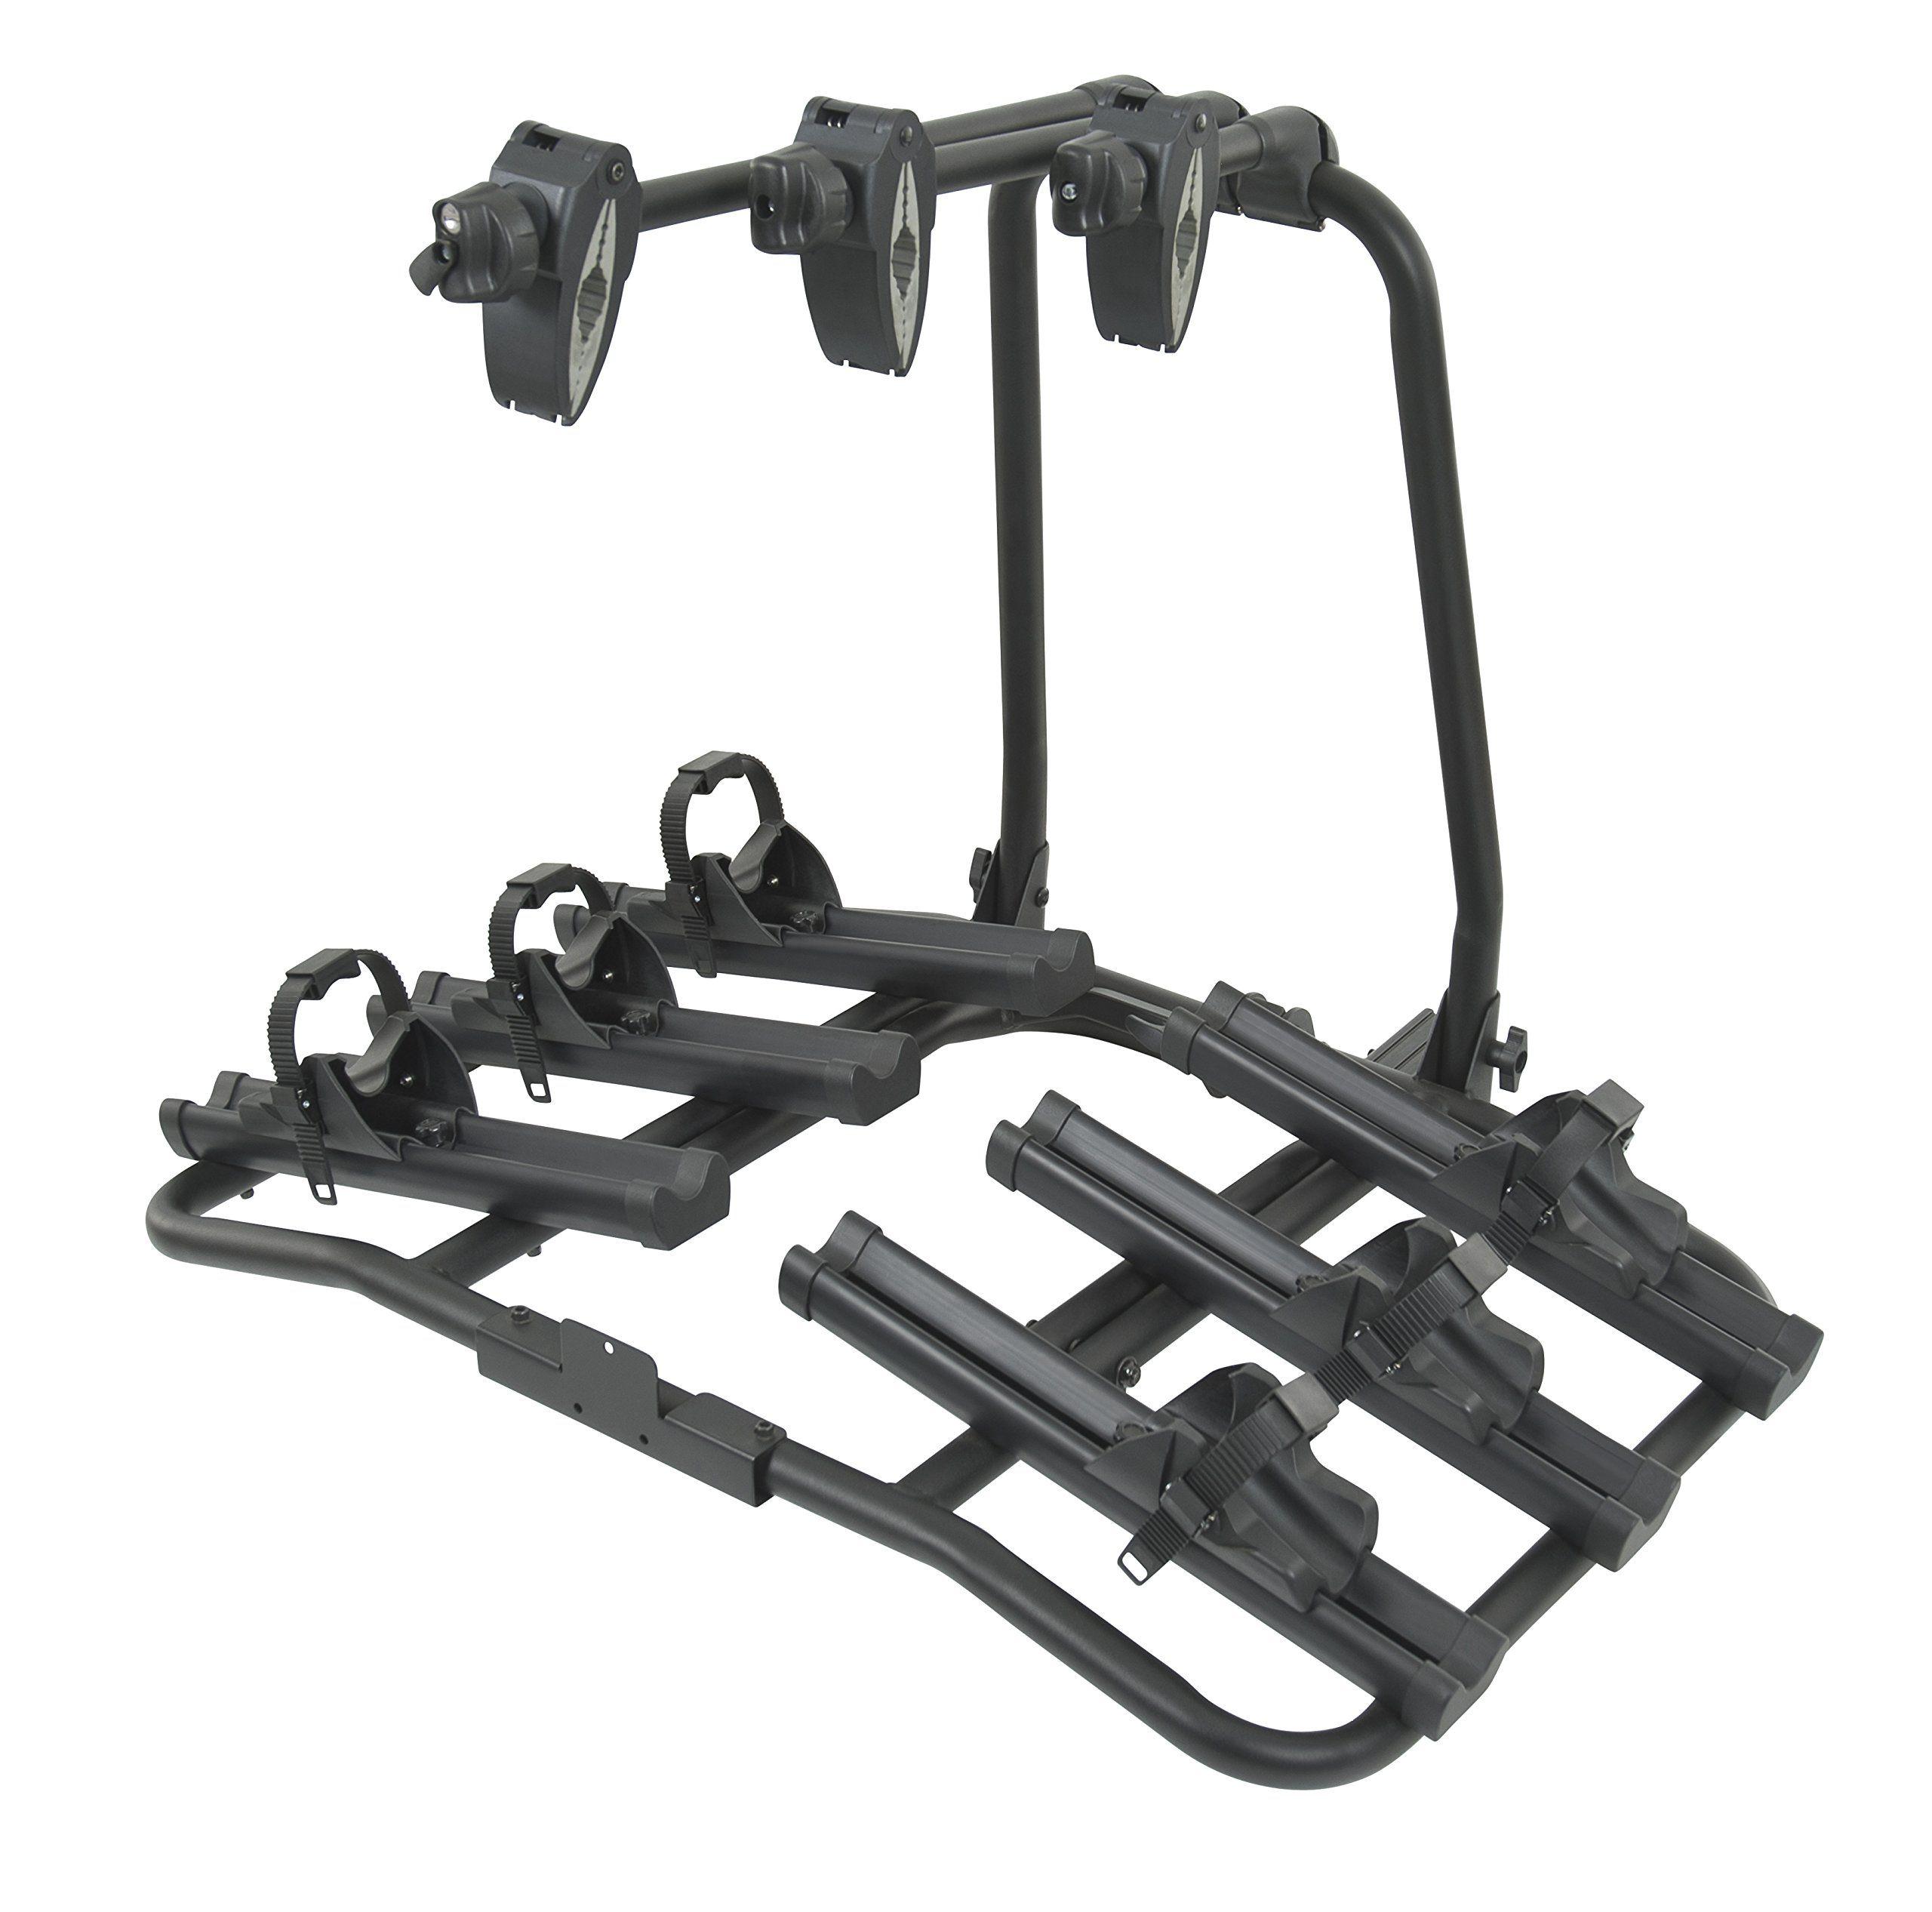 trailer bike malone package main rack specs com microsport outdoorplay